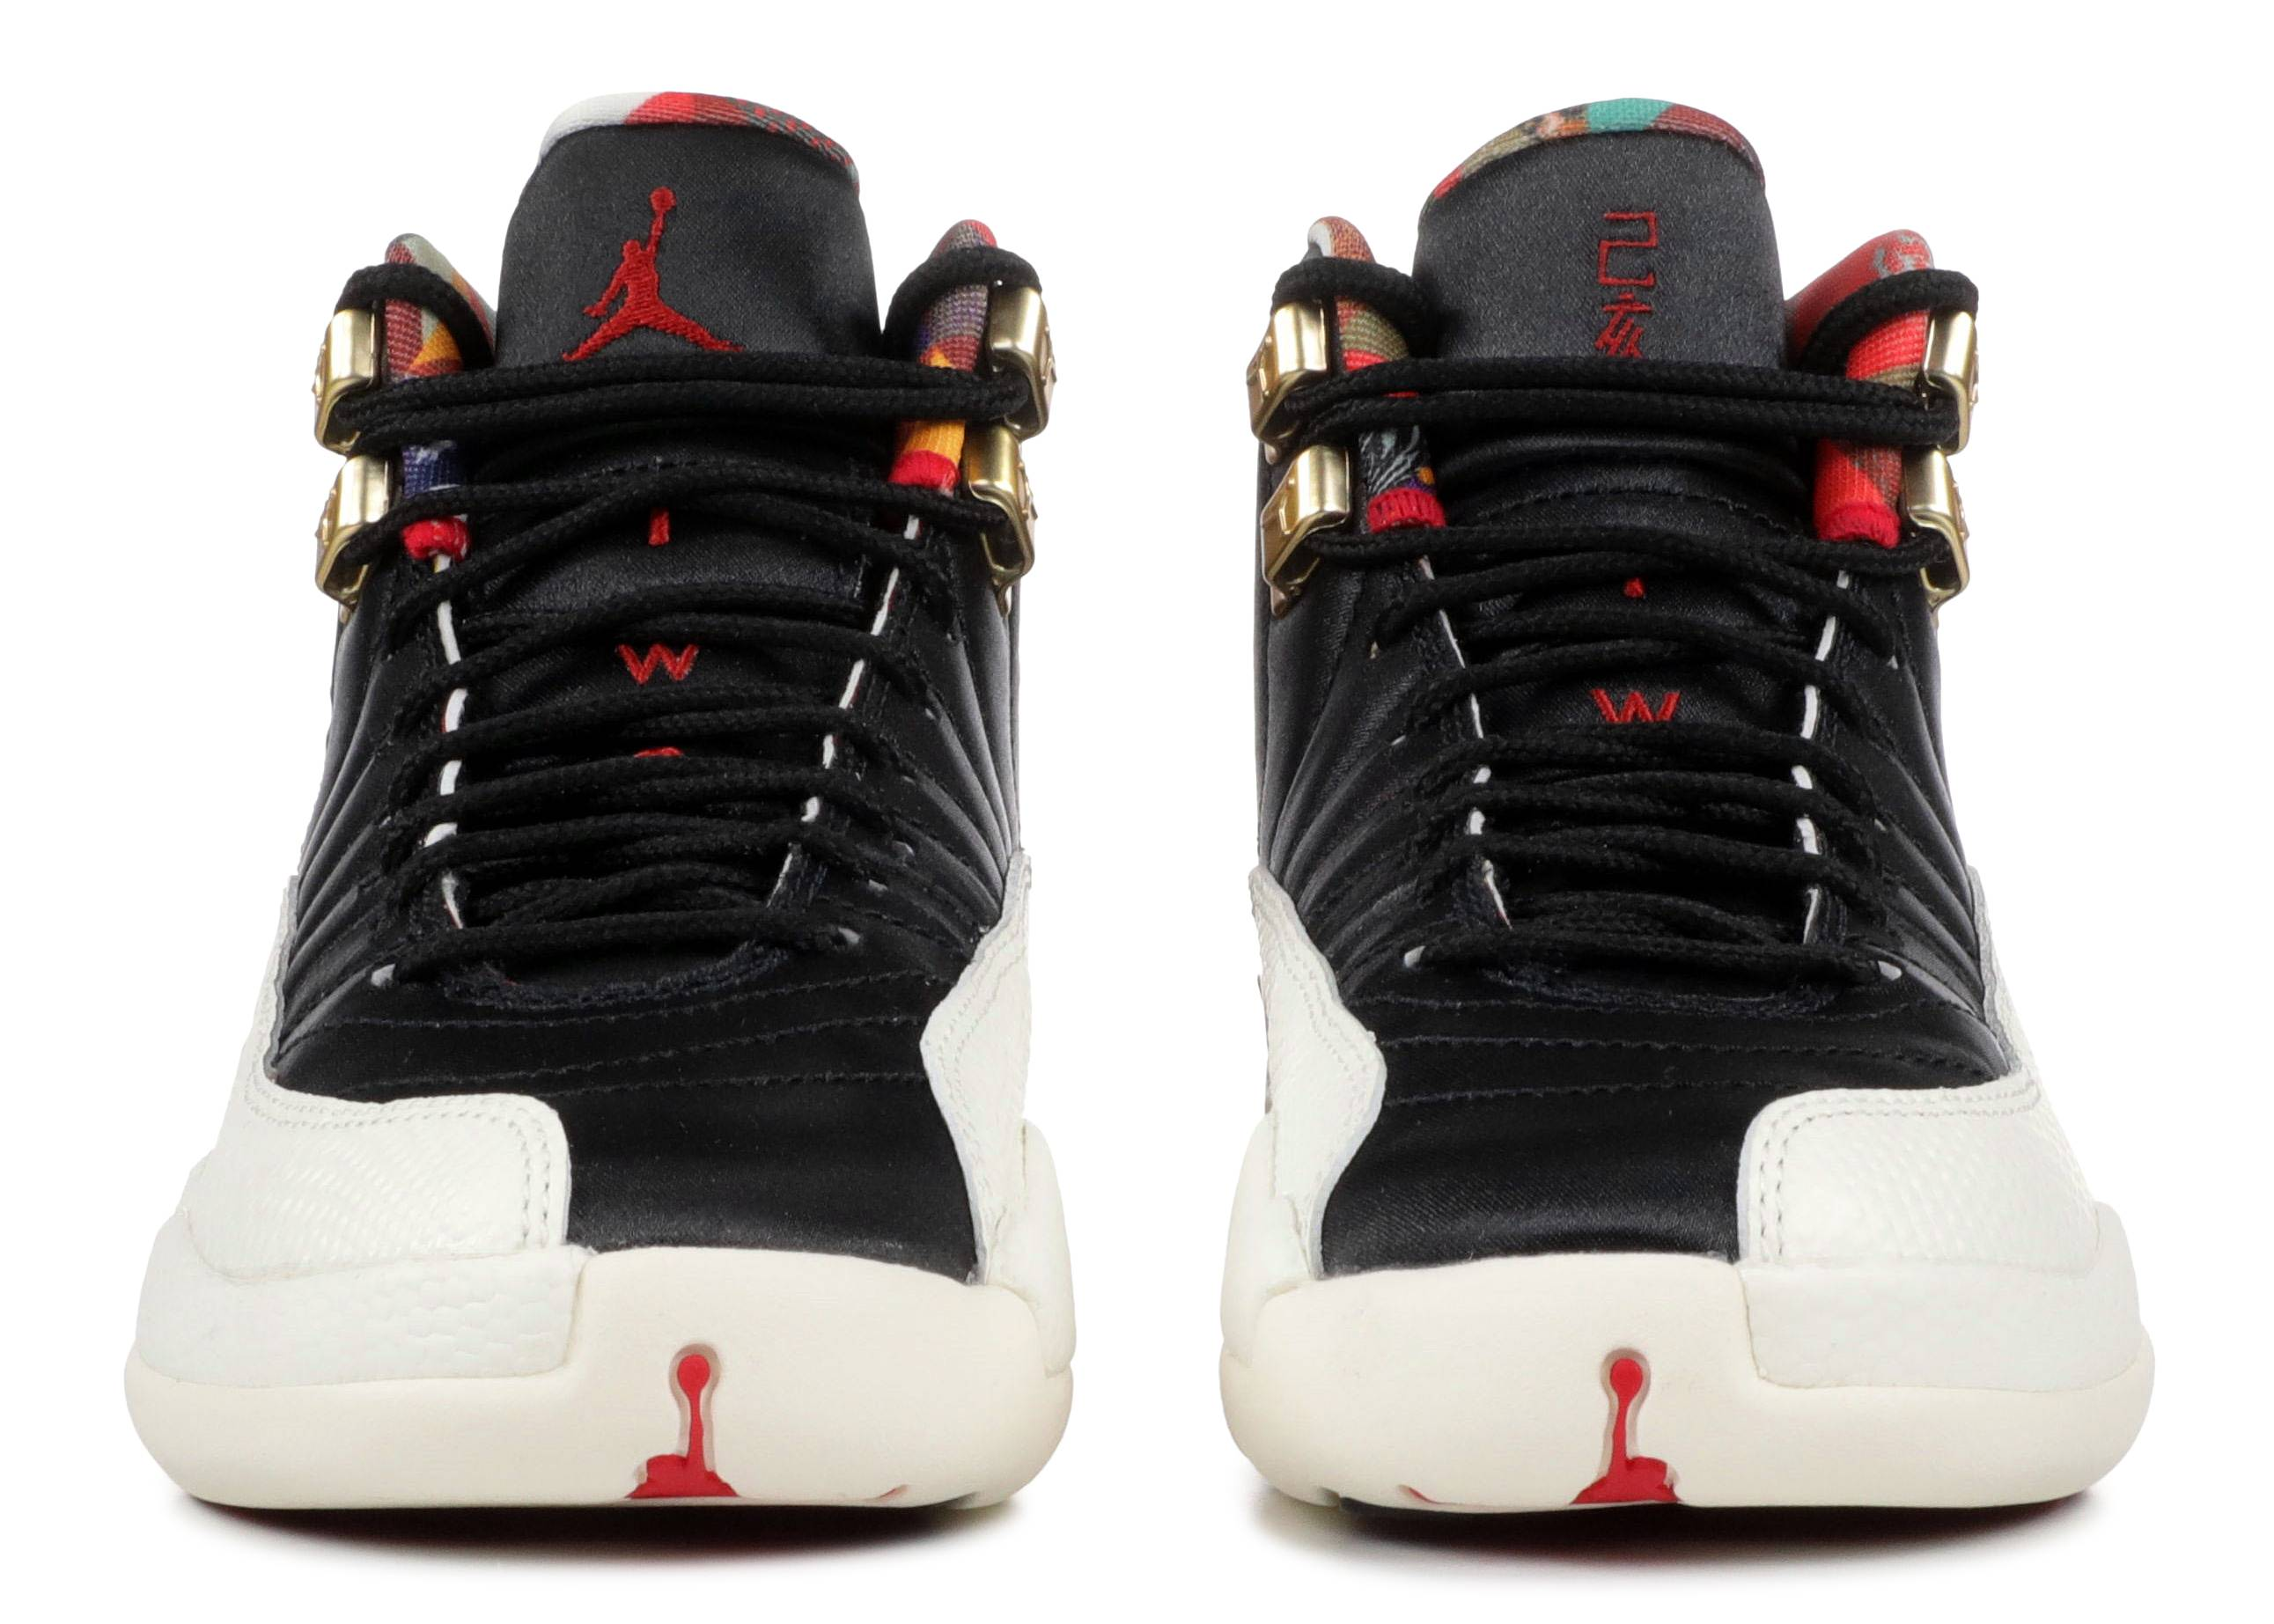 b800bcec9817 Air Jordan 12 Retro Cny (gs) - Air Jordan - bq6497 006 - black true  red-sail